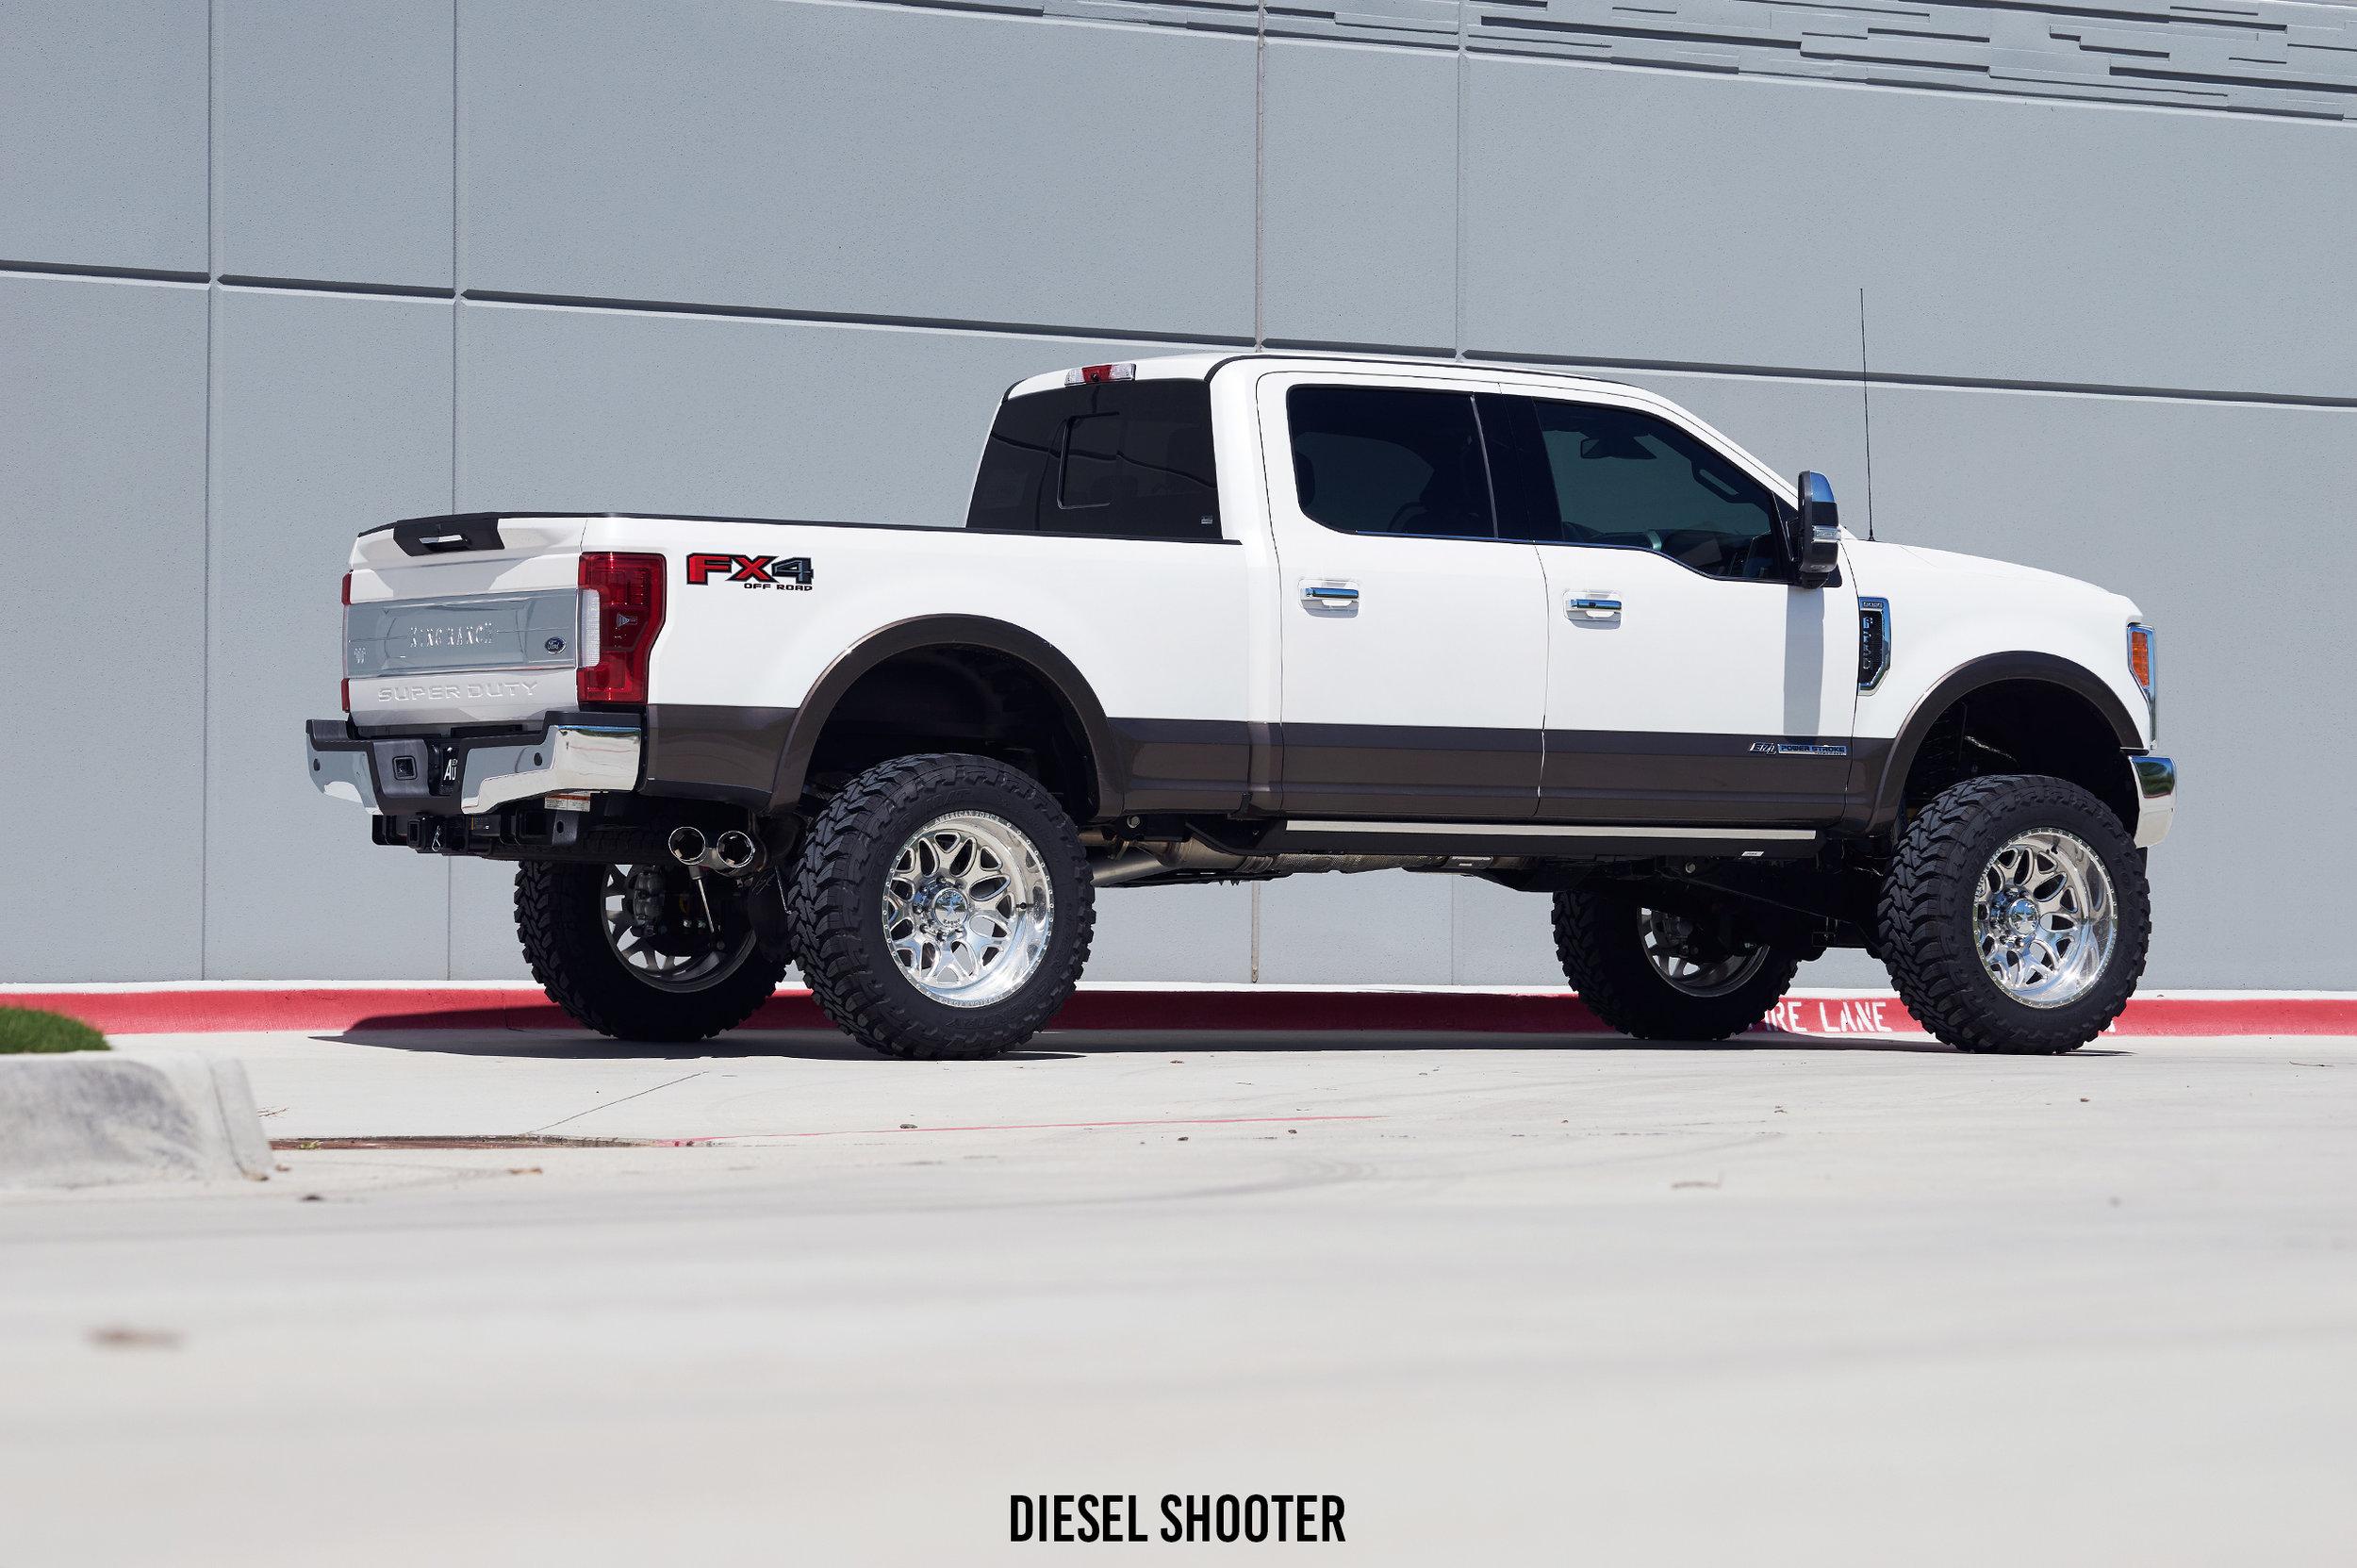 Best Off Road Tires For Trucks >> 2017 Ford F250 Platinum - Fuel Off-Road - FTS — Diesel Shooter